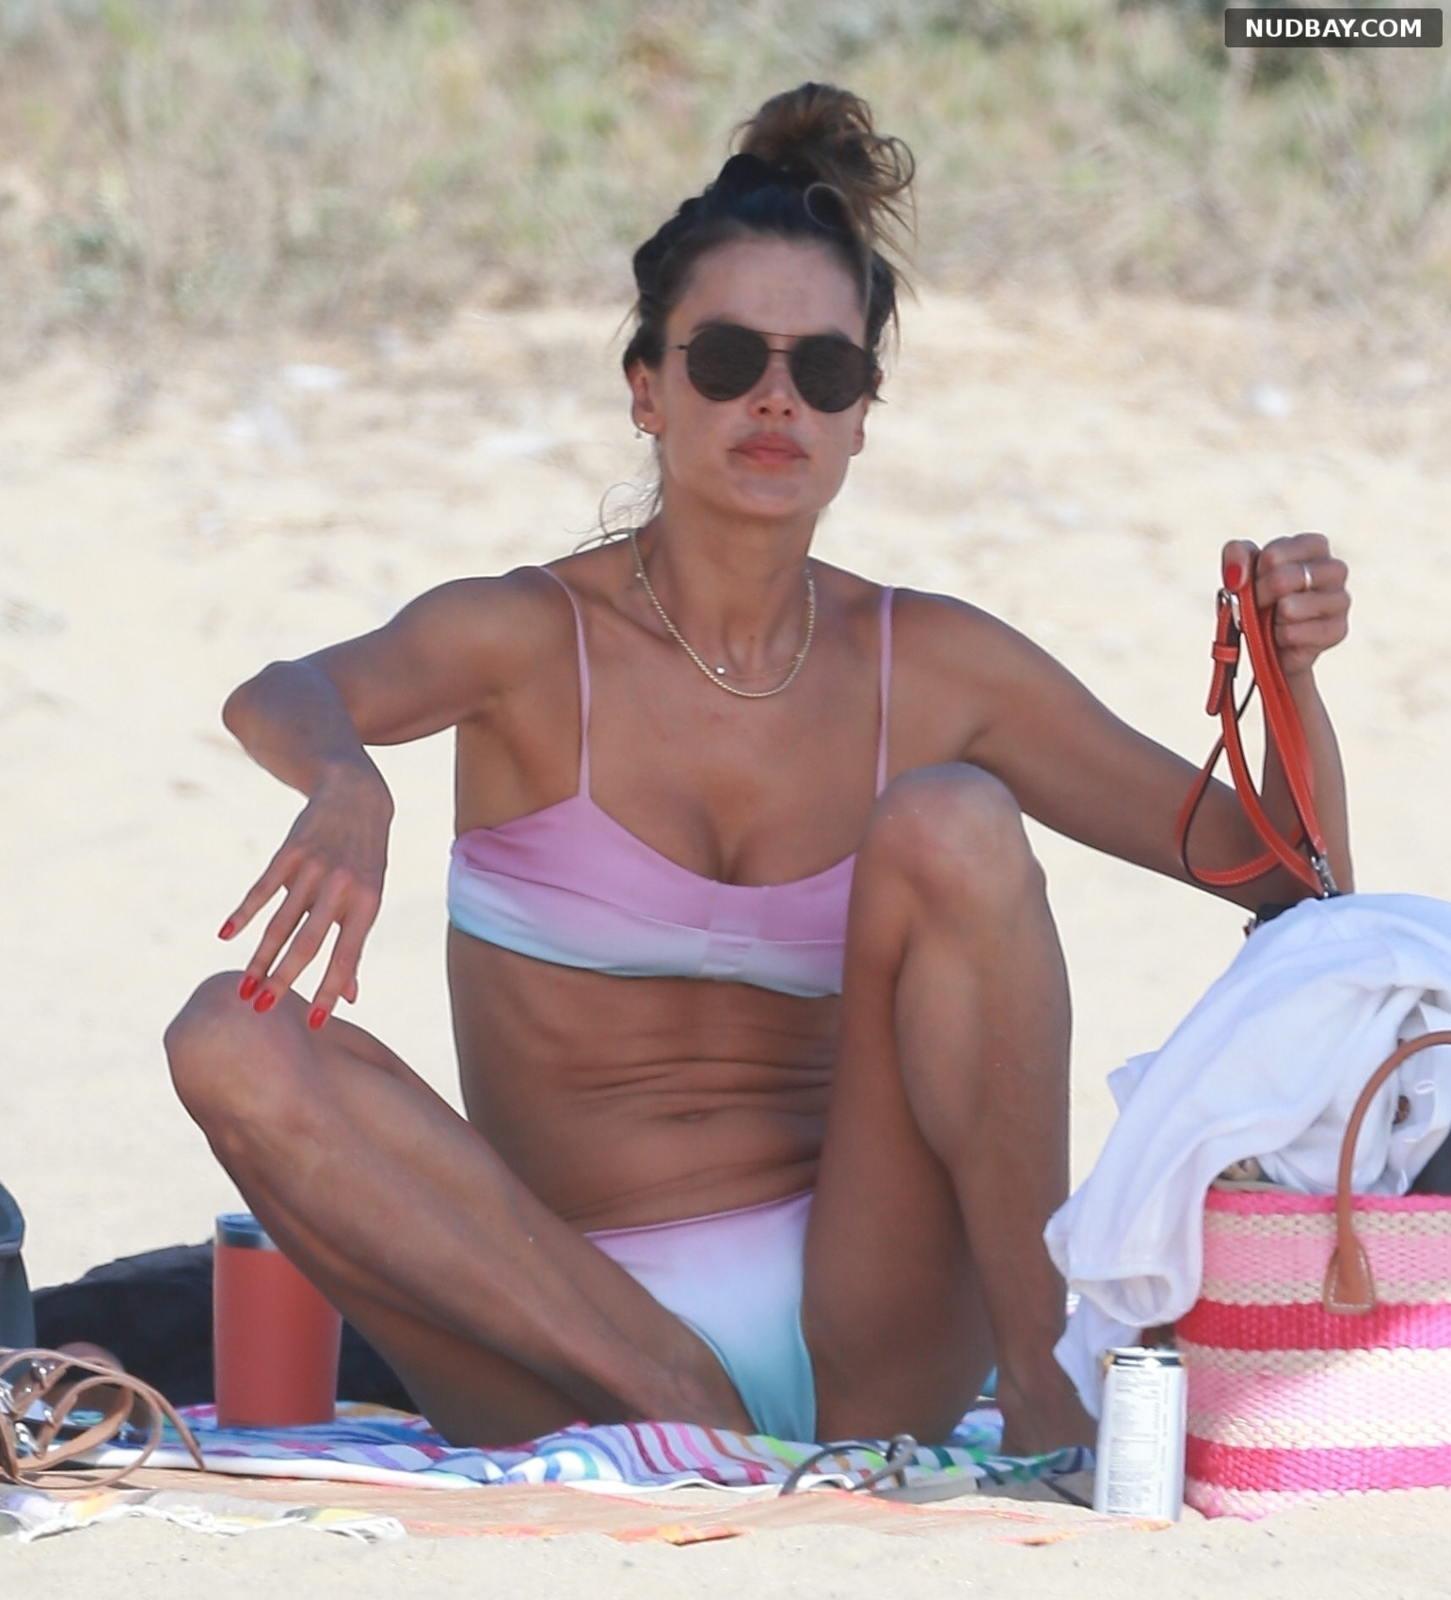 Alessandra Ambrosio pussy on the beach in Santa Monica Sep 19 2020